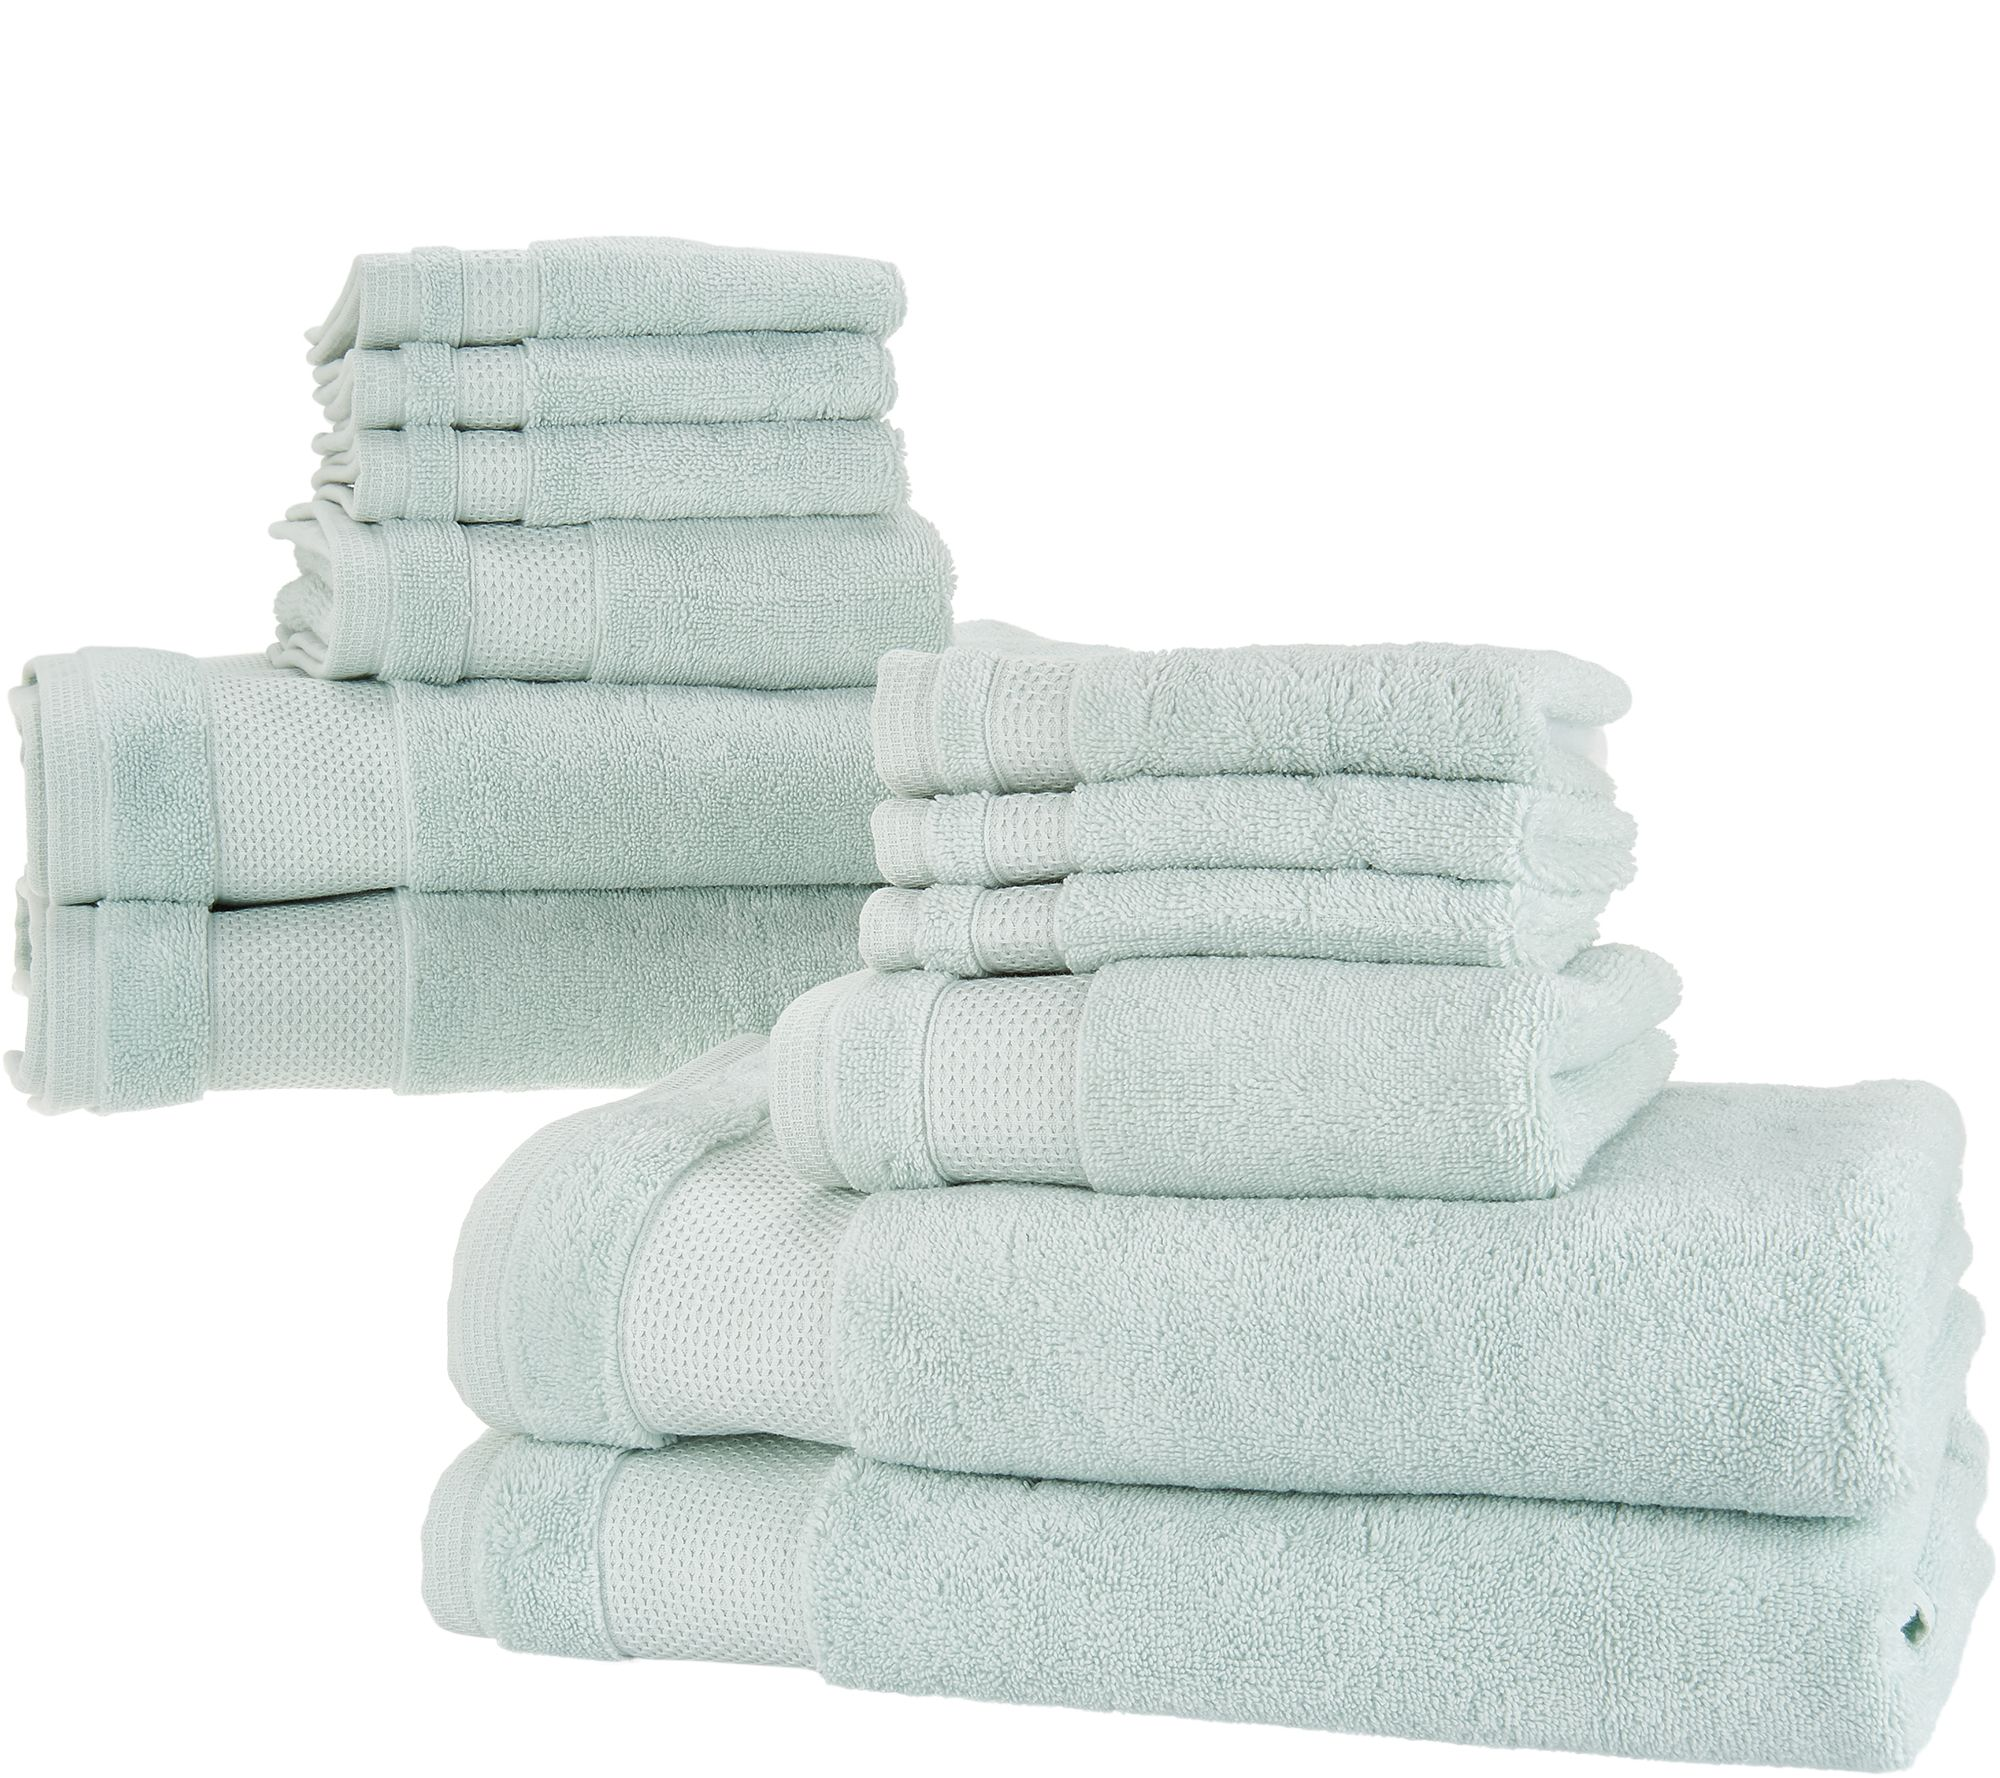 Scott Living 12-Piece 100% HygroCotton Bath Towel Set - Page 1 — QVC.com